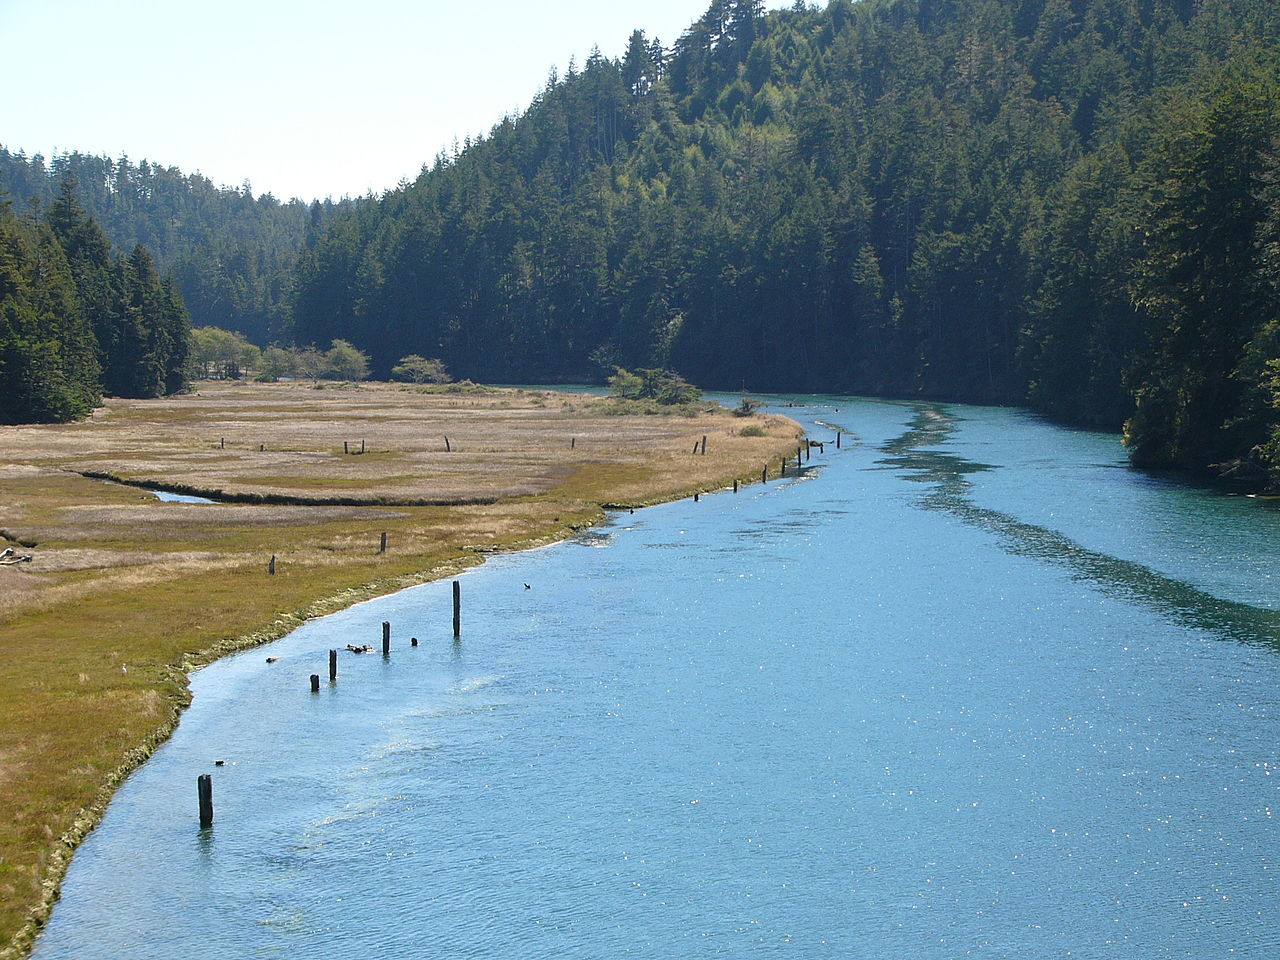 1280px-Big_River_California.jpg